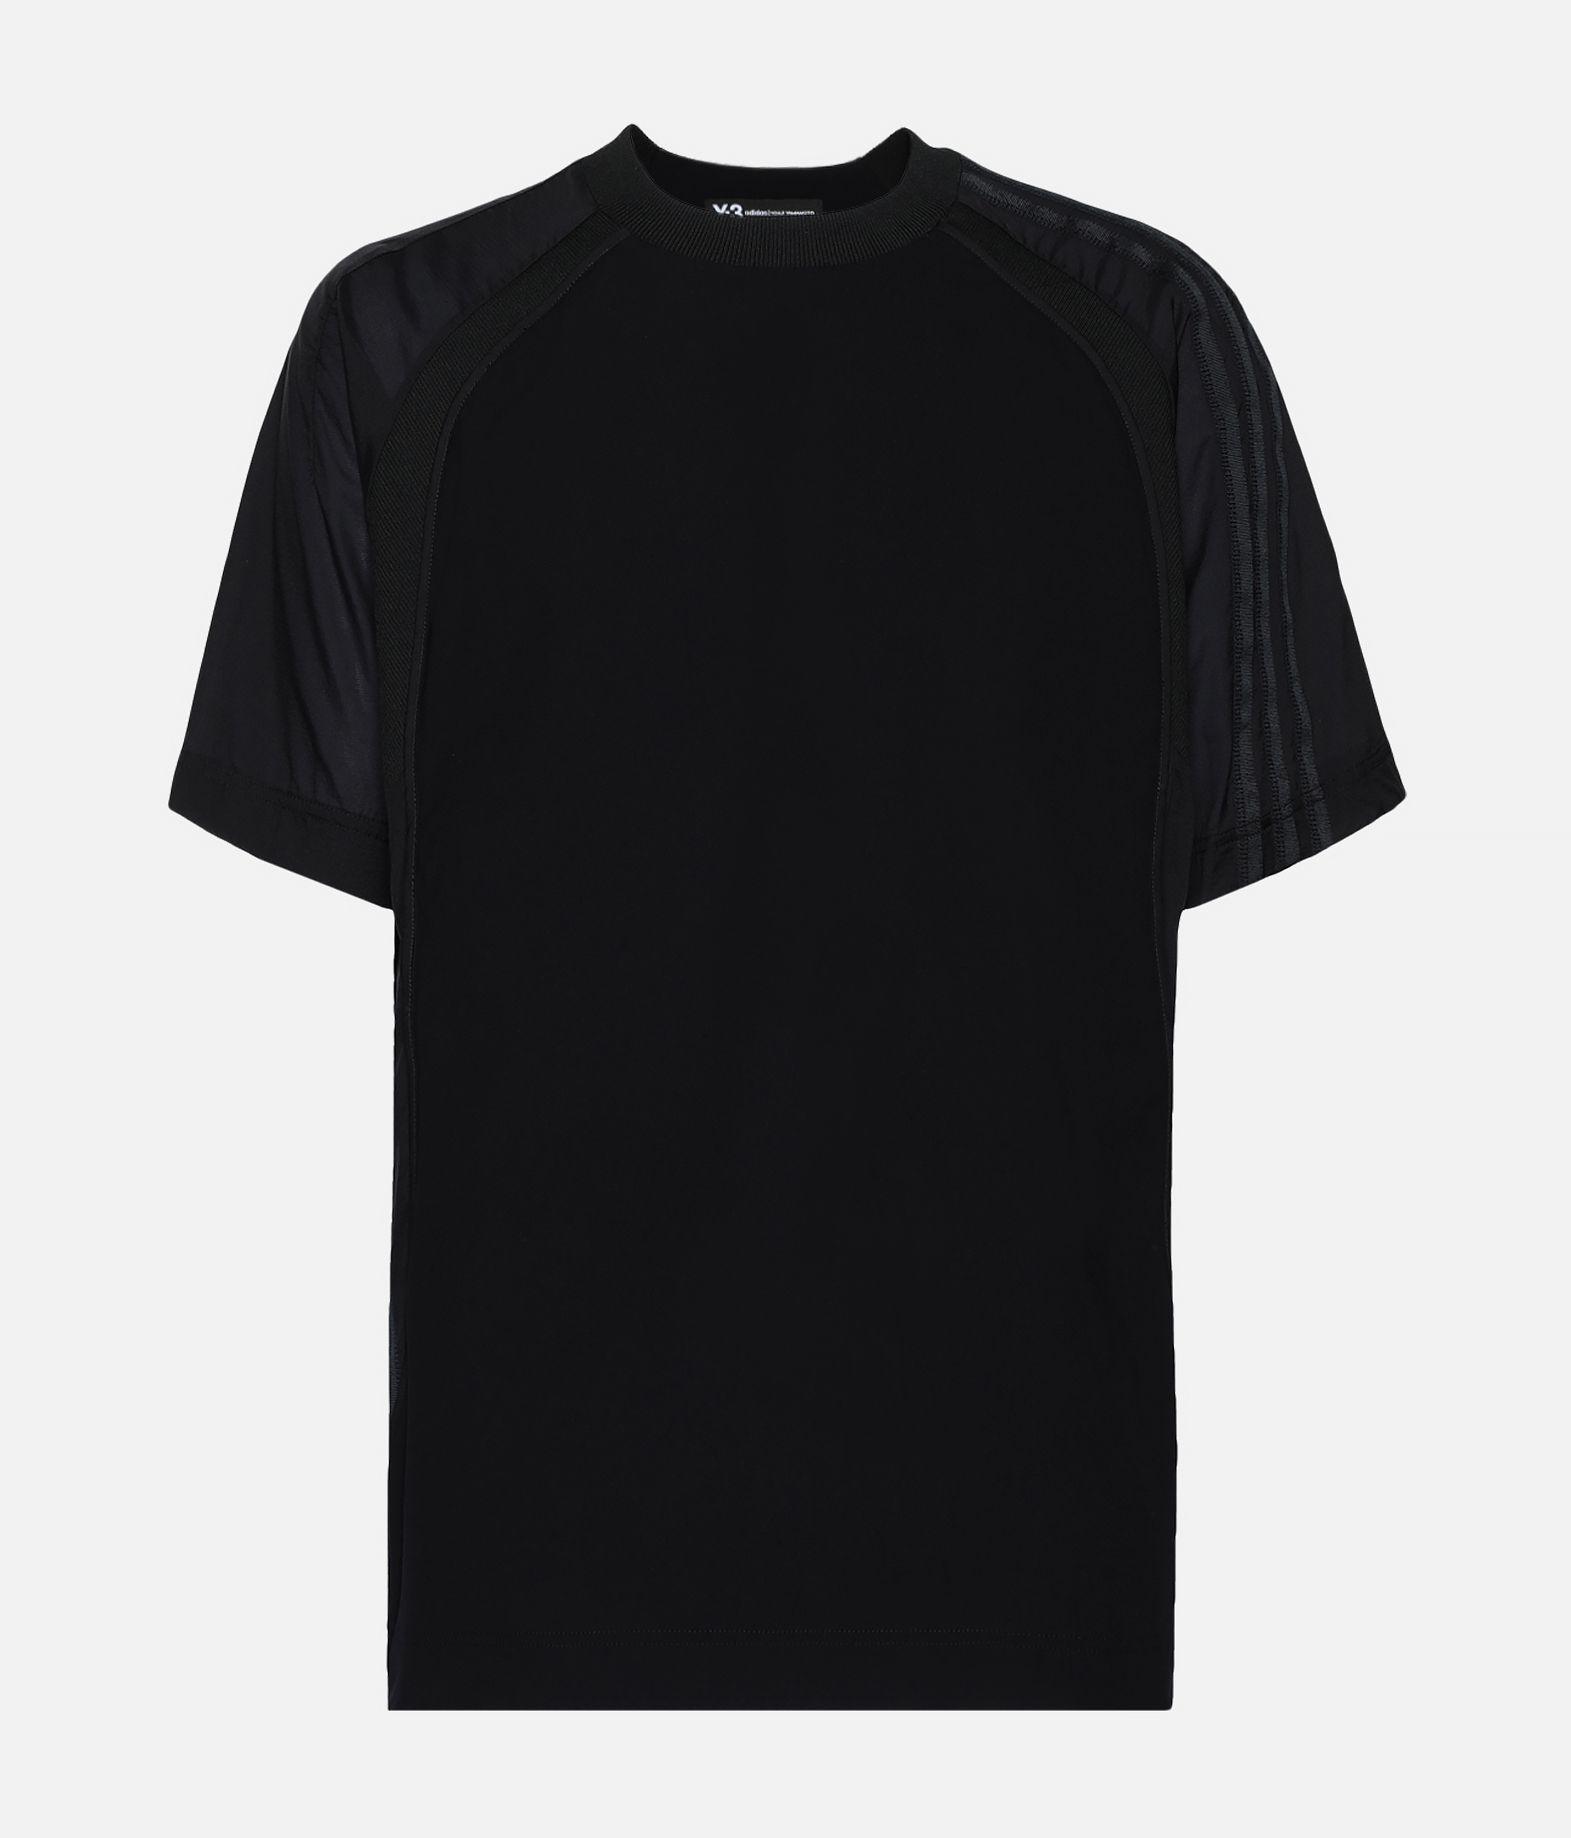 Y-3 Y-3 3-Stripes Material Mix Tee T-shirt maniche corte Uomo f